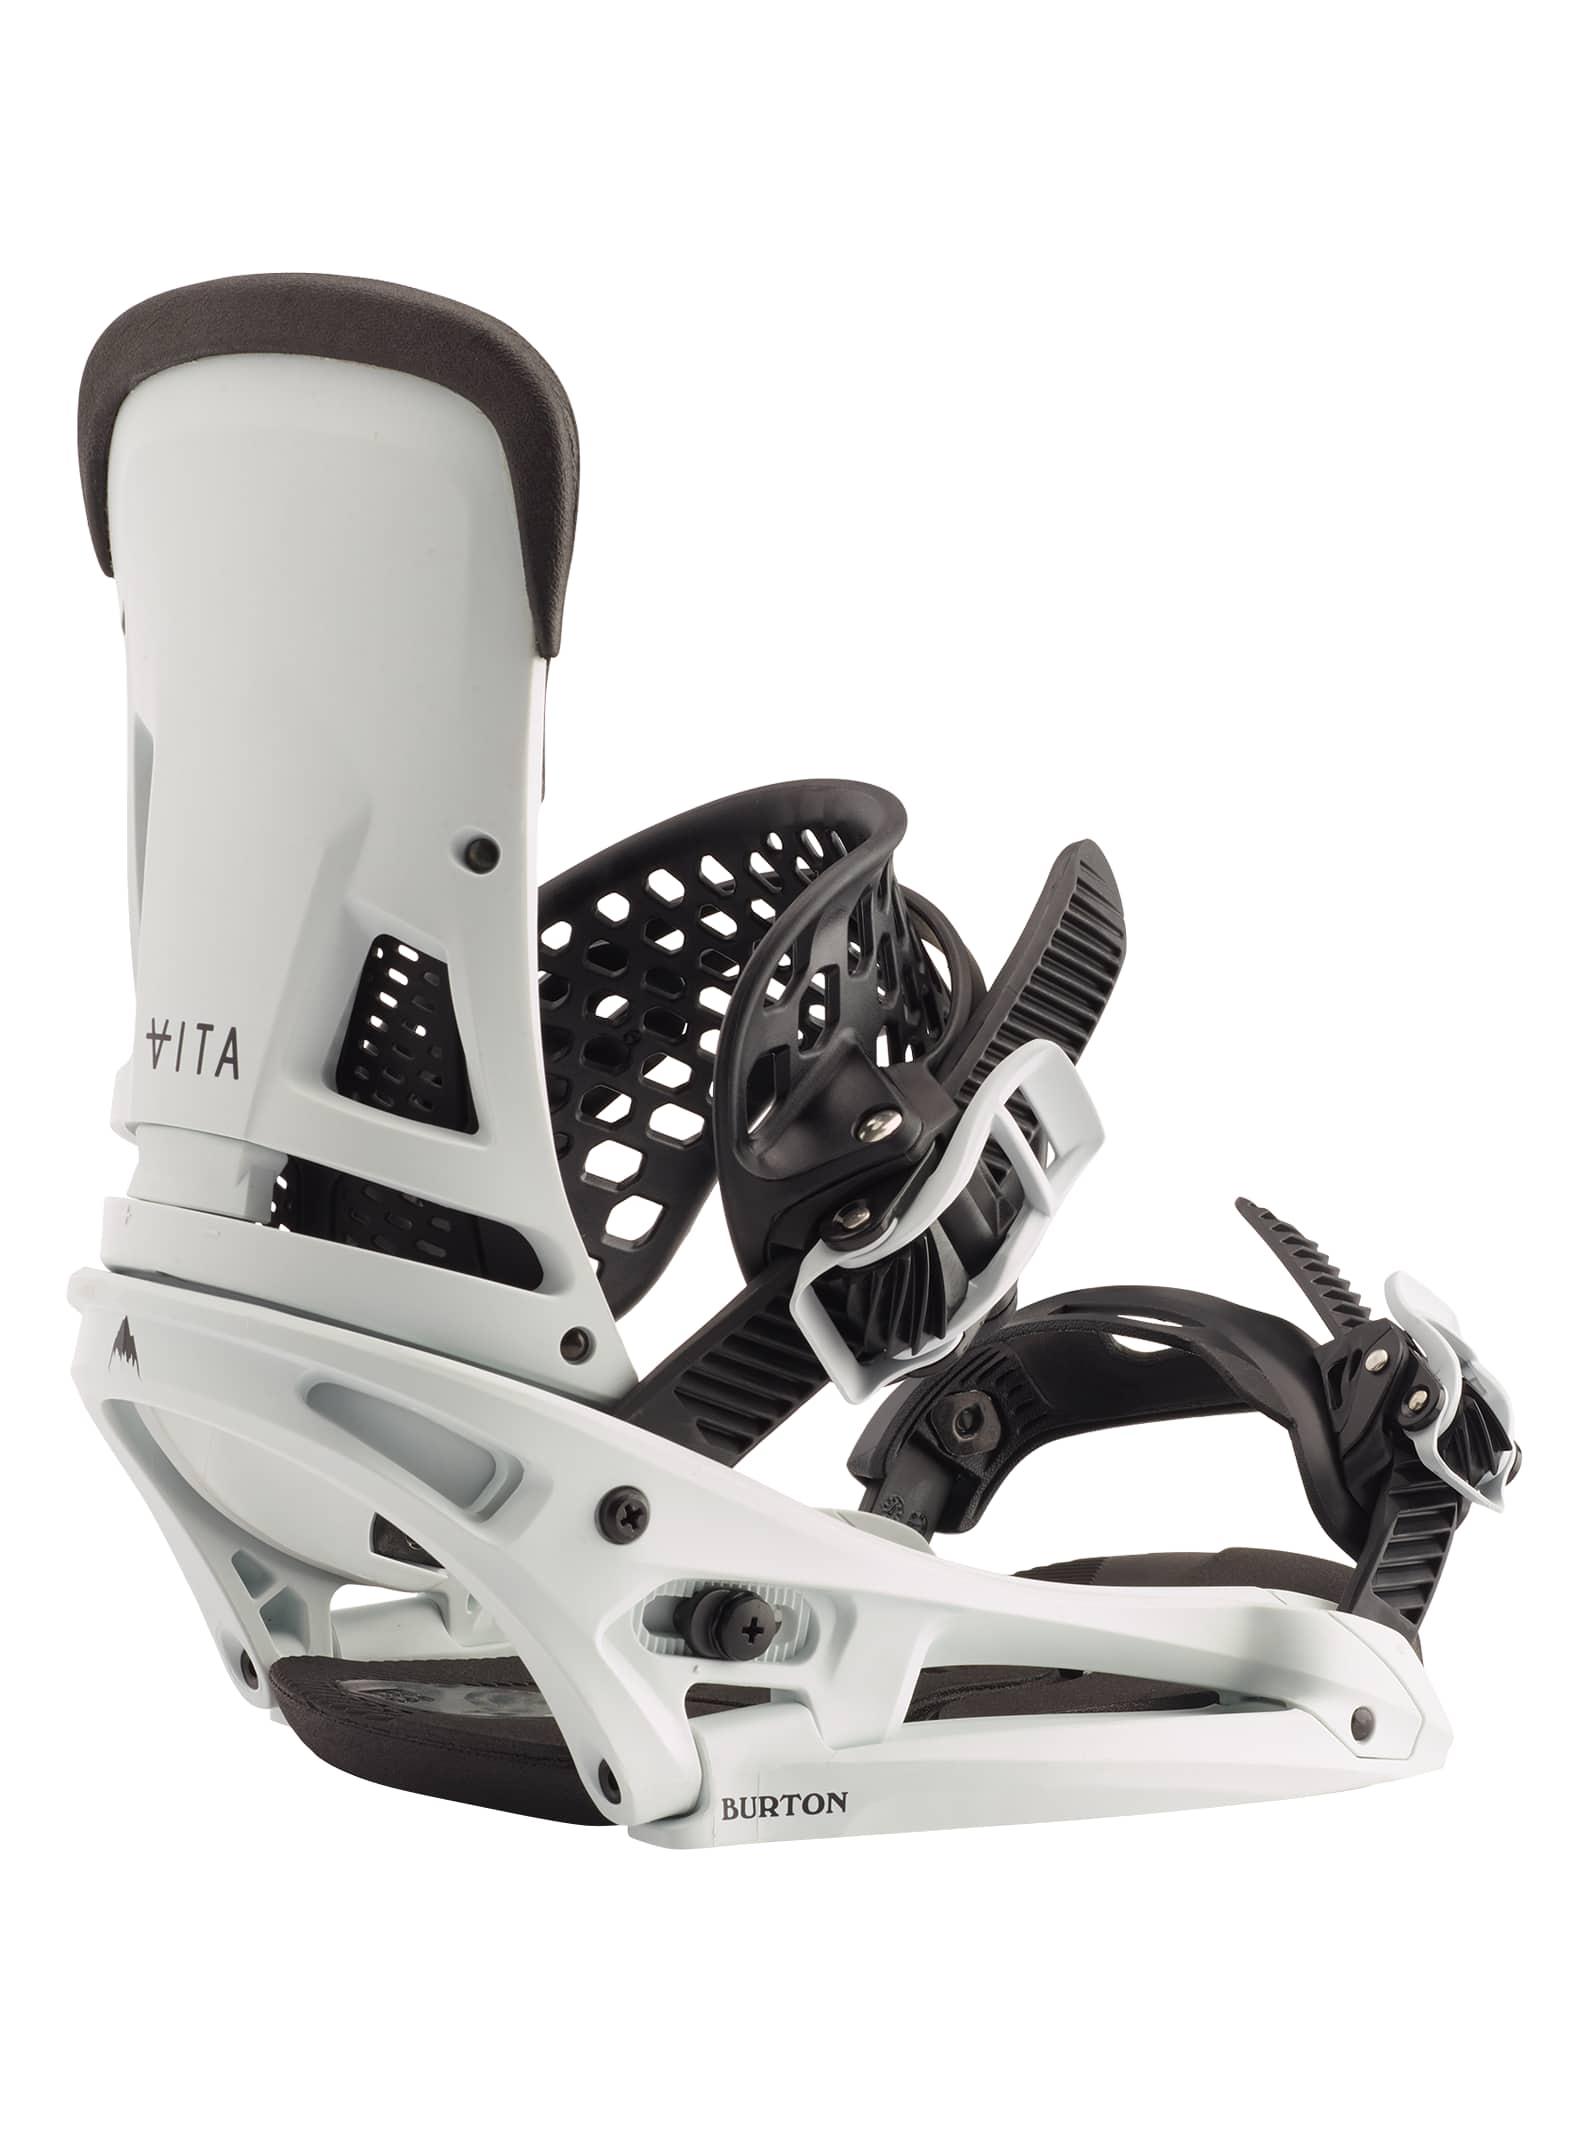 Edge Infinity Models Ride Snowboard Bindings Black Toe Slider Strap Set